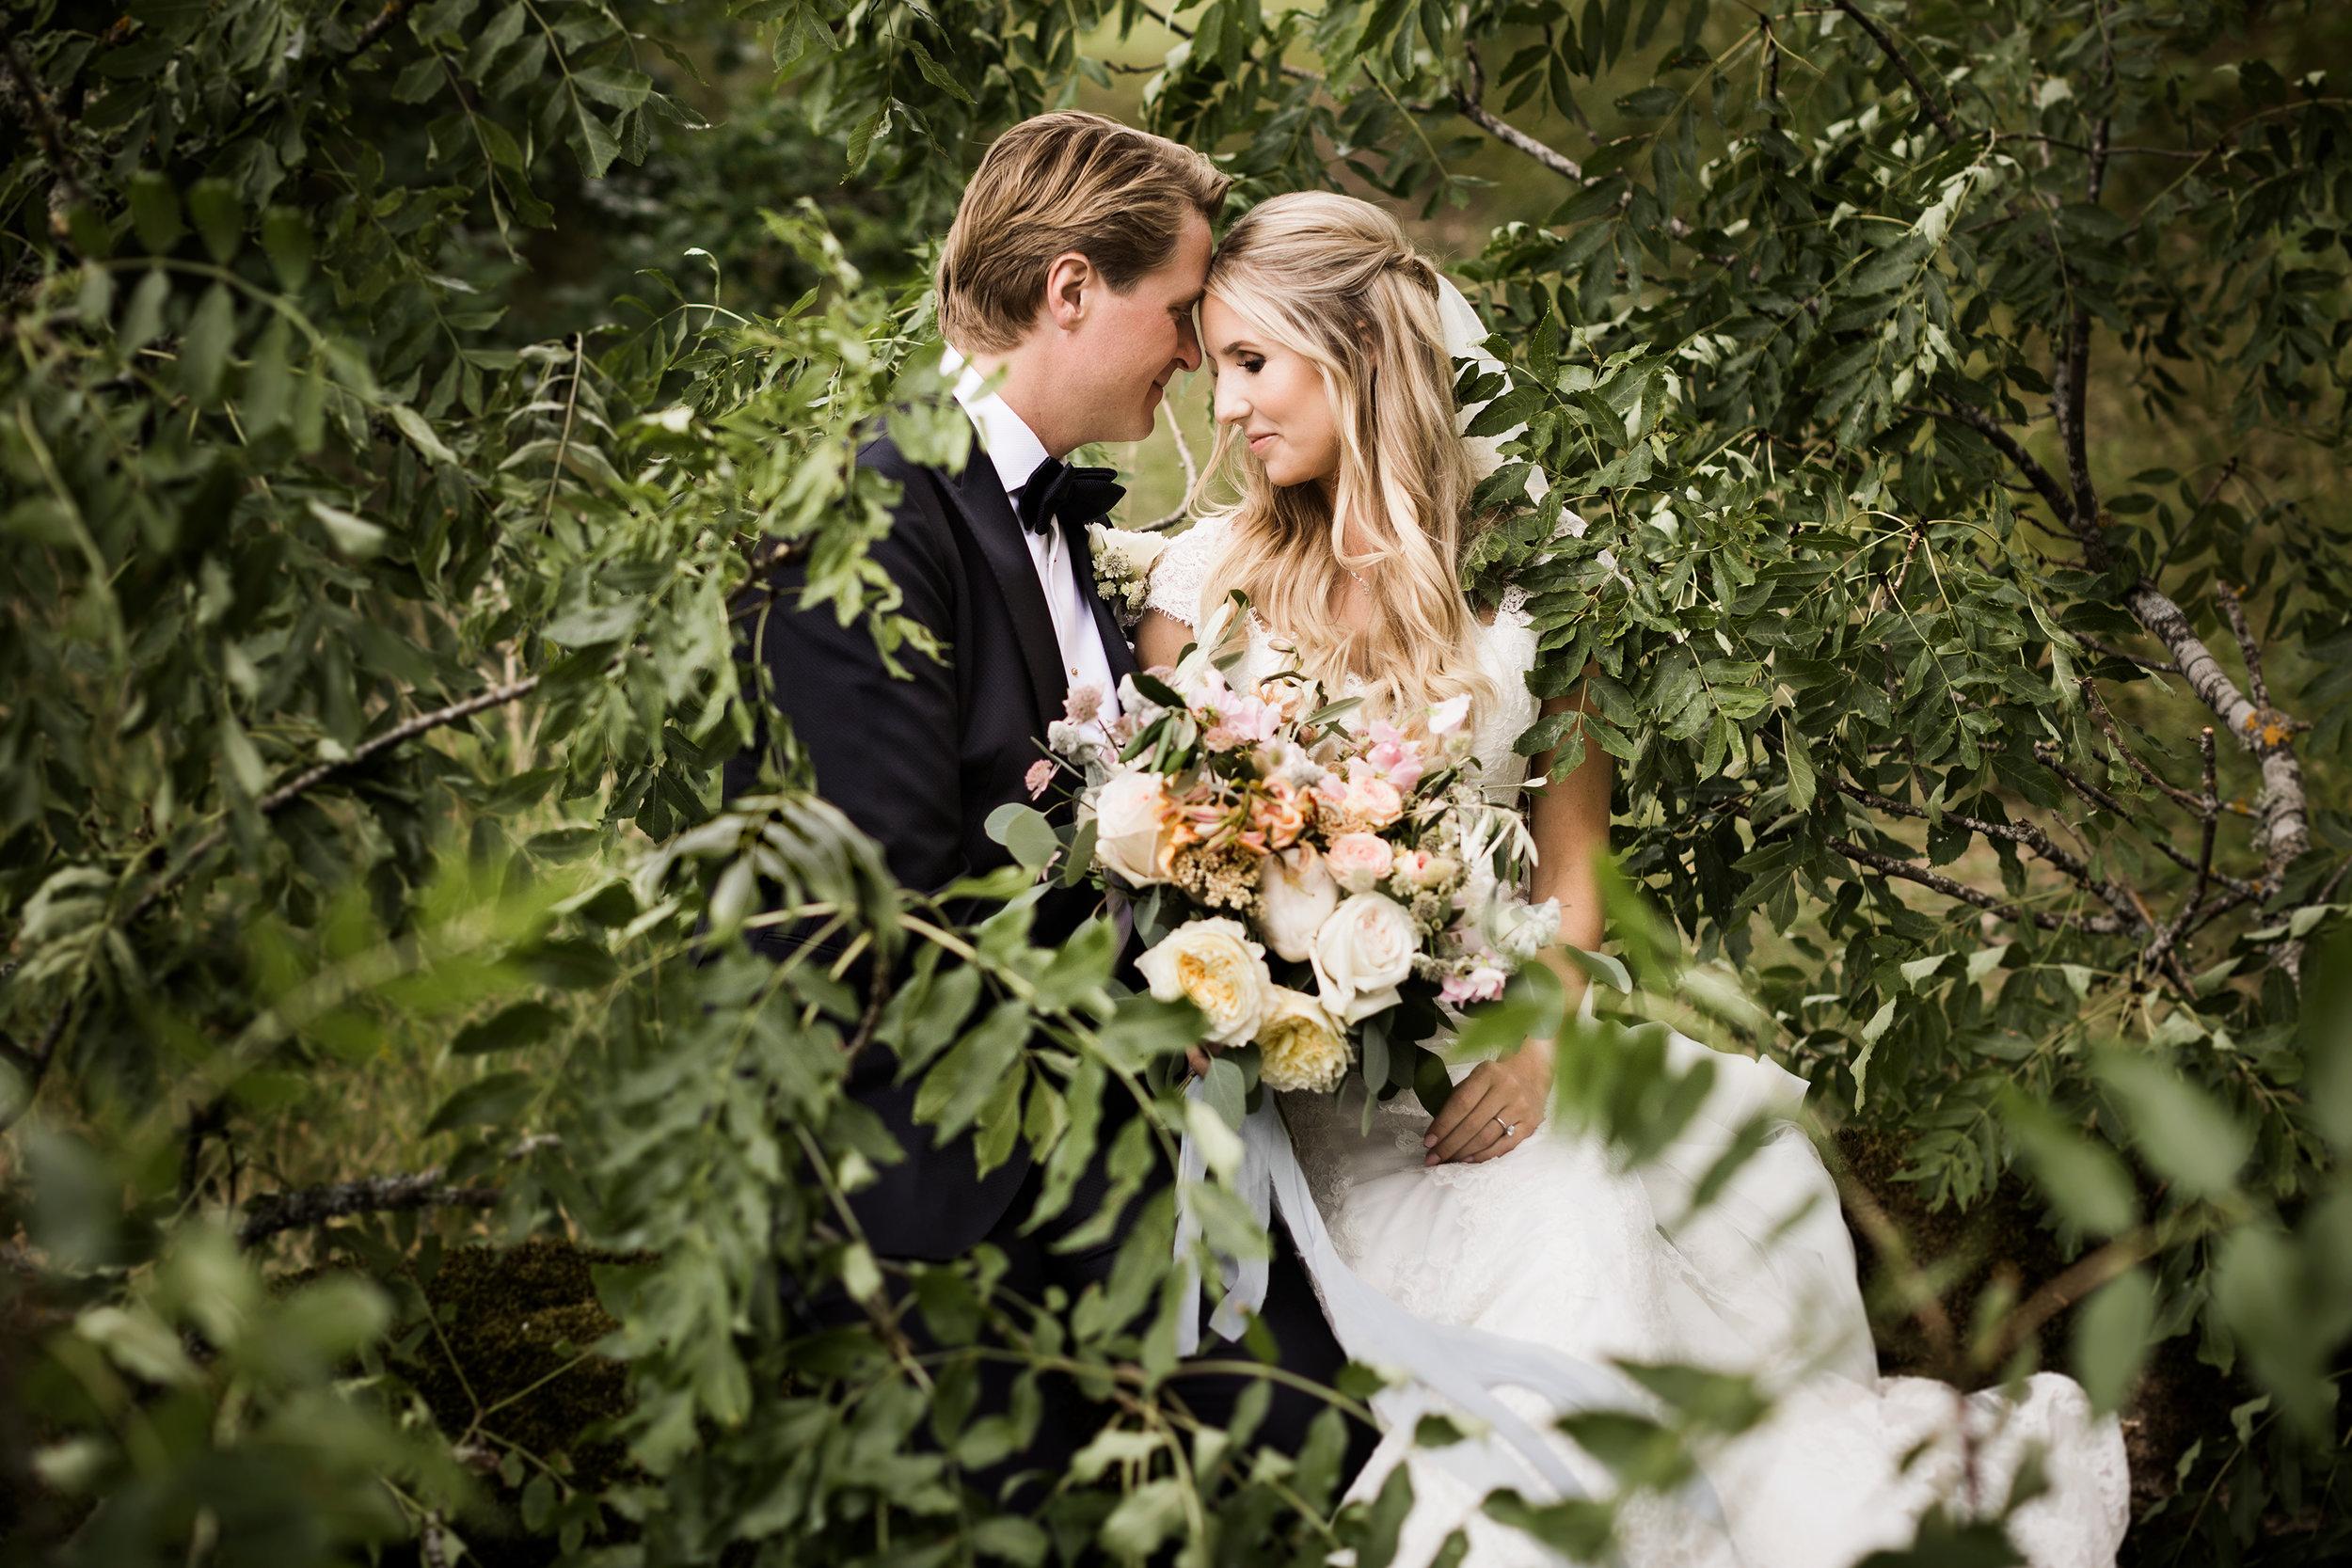 wedding-portrait-södertuna.jpg